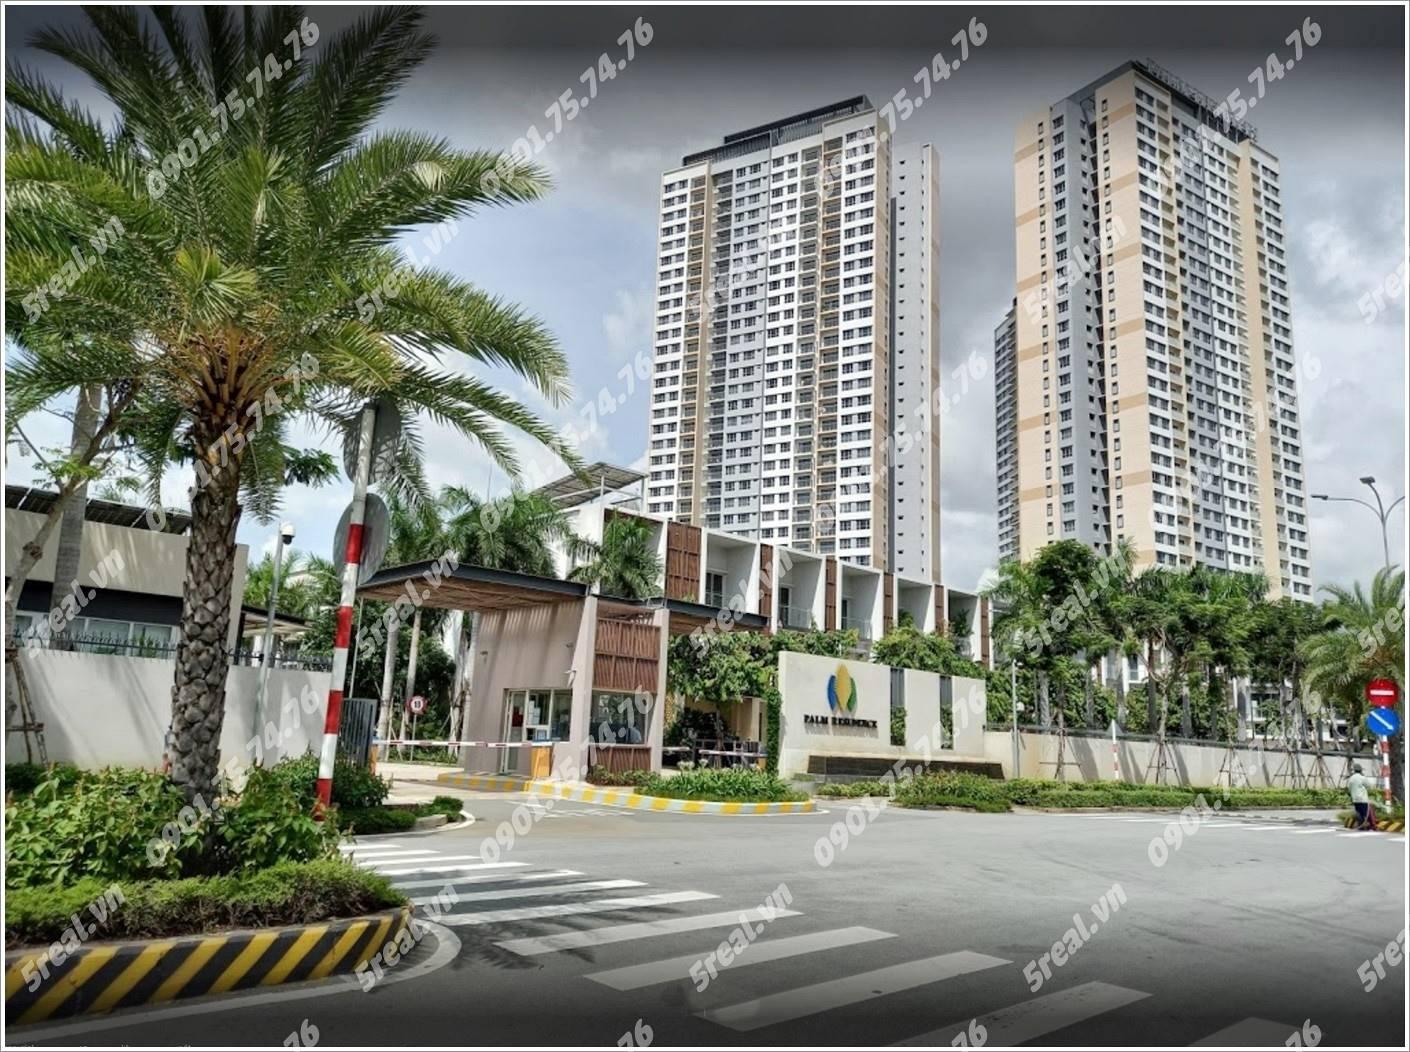 palm-residence-song-hanh-quan-2-van-phong-cho-thue-5real.vn-01